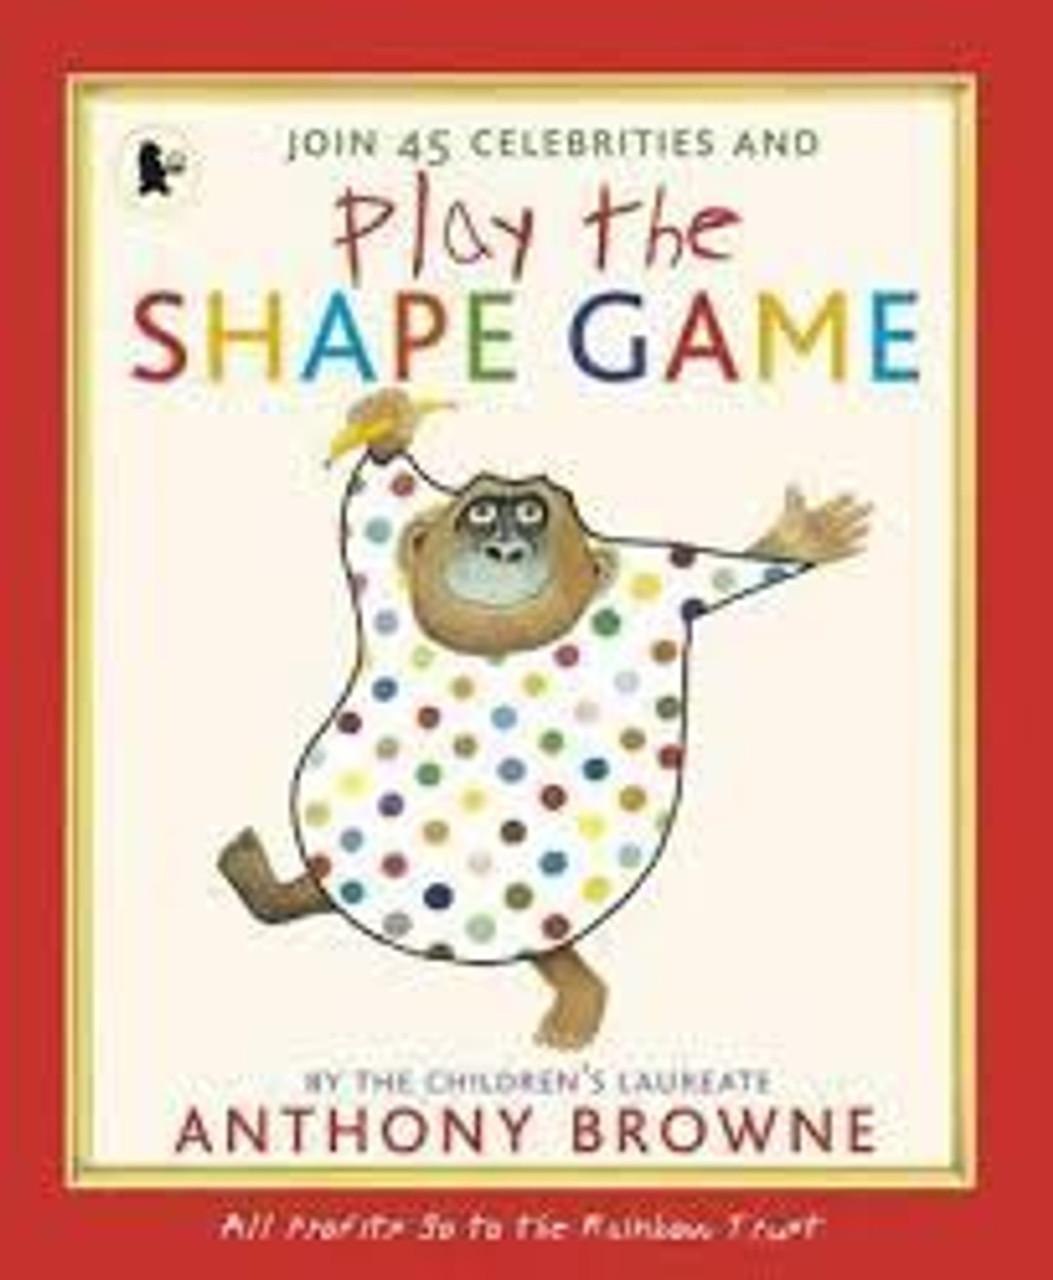 PLAY THE SHAPE GAME (PB)